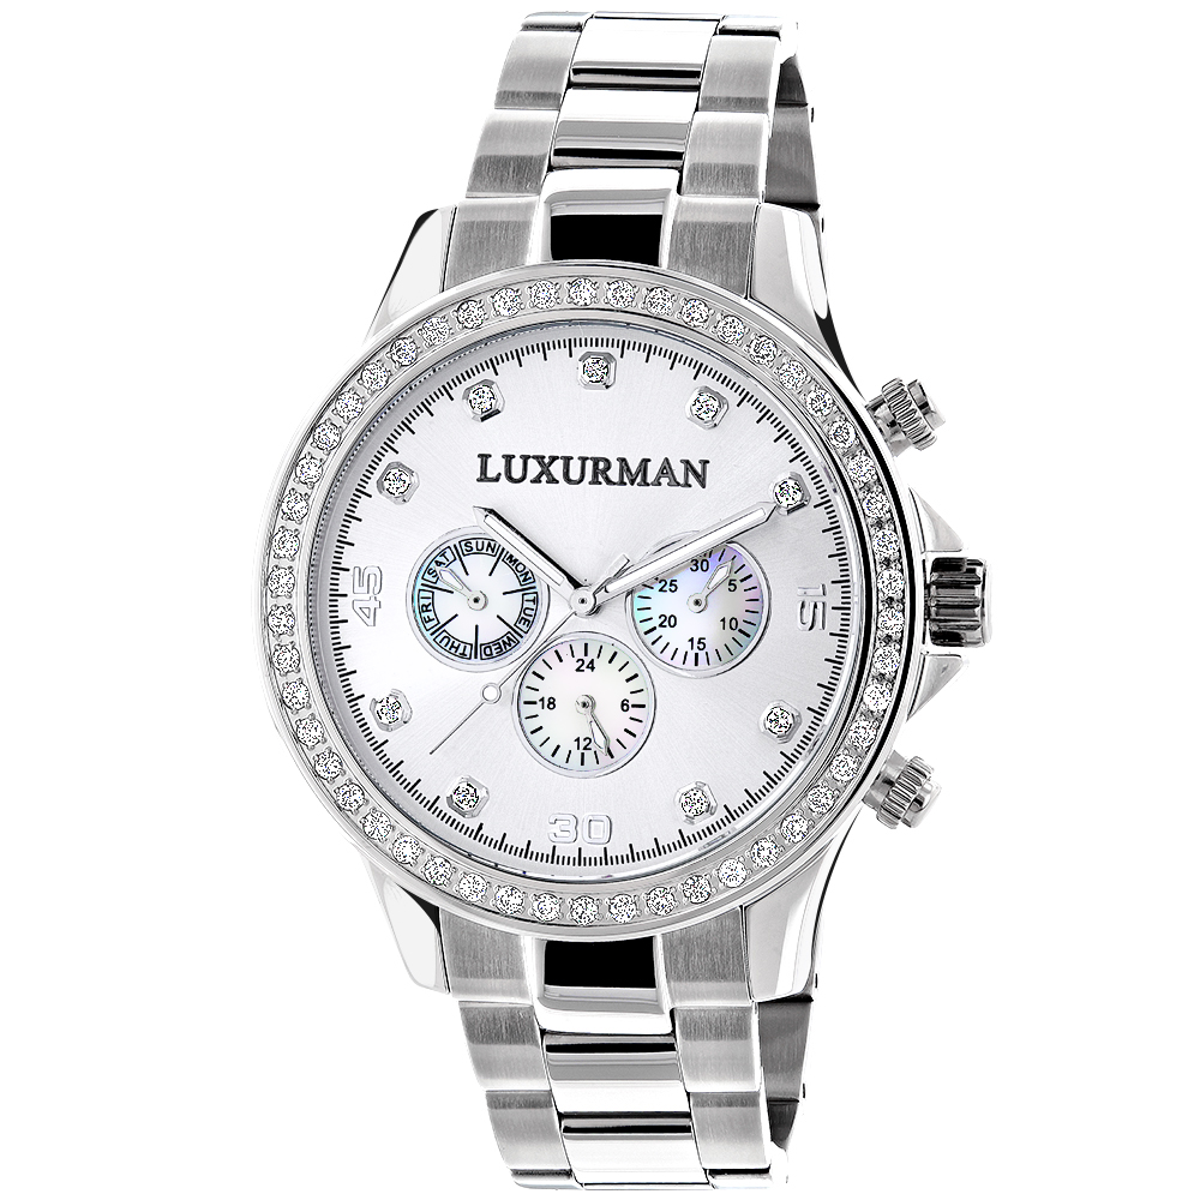 Limited Edition Mens Diamond Watch 2ct Luxurman